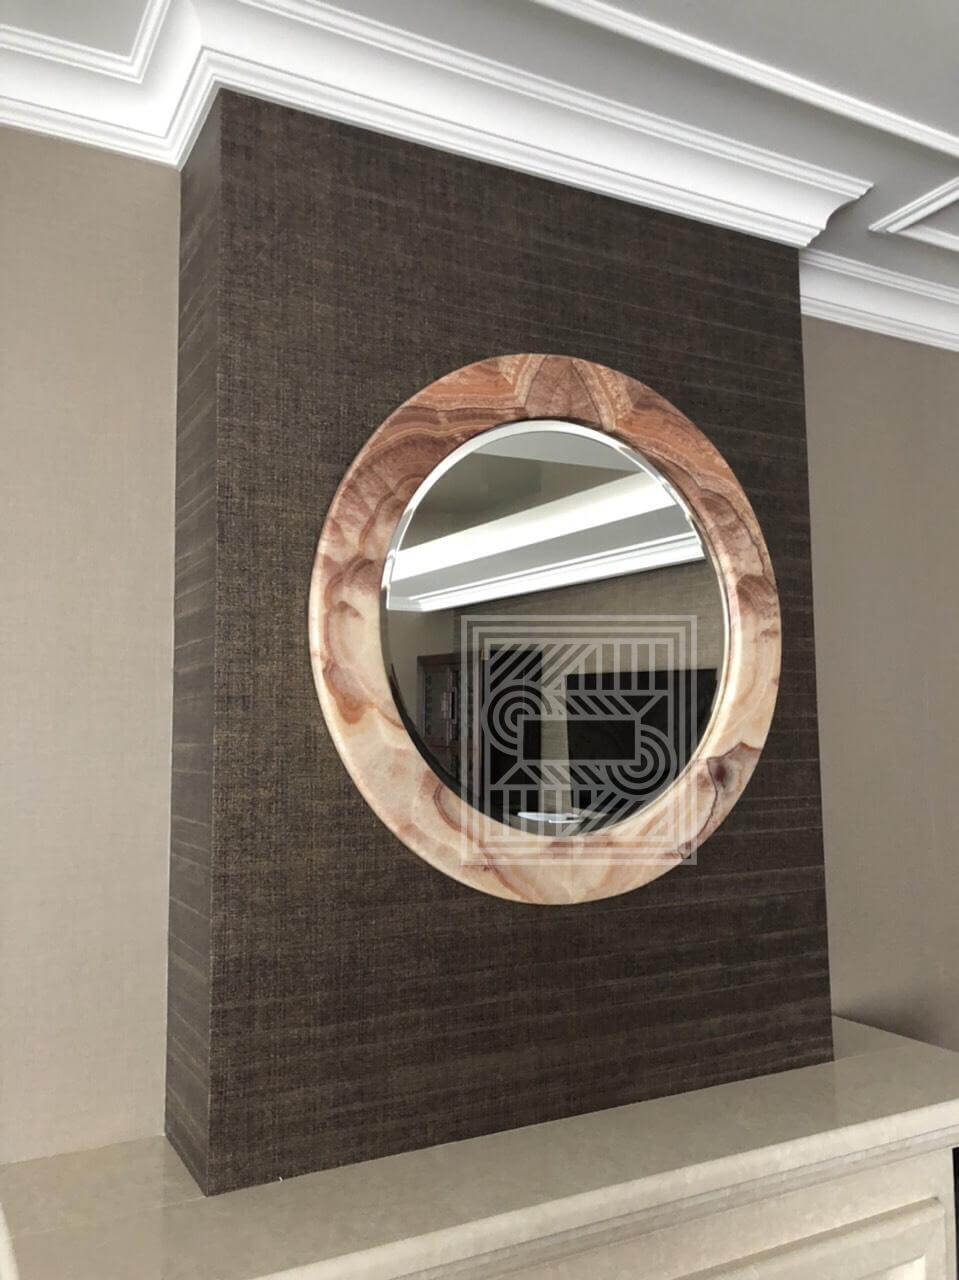 Обрамление для зеркала из оникса Kilimangiaro Viola 20 mm furniture - IMG 3439